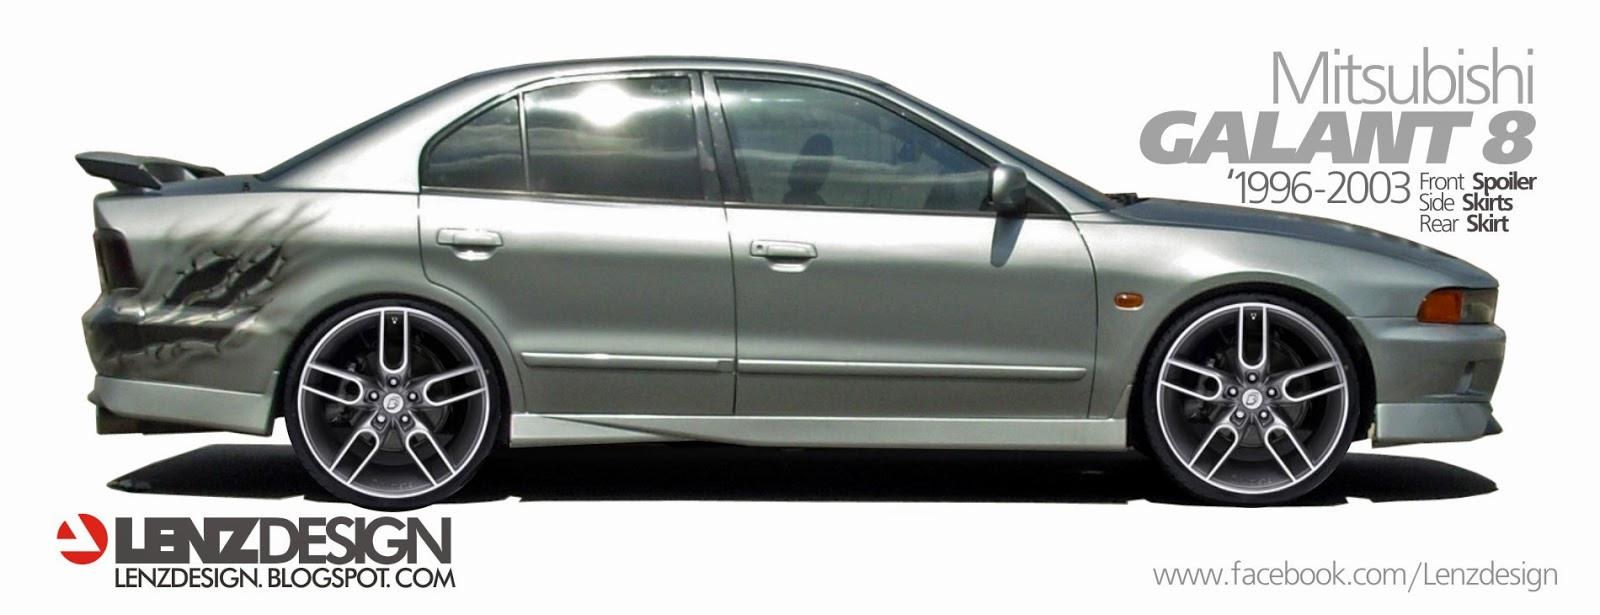 Mitsubishi Galant Tuning Lenzdesign Performance Body Kit